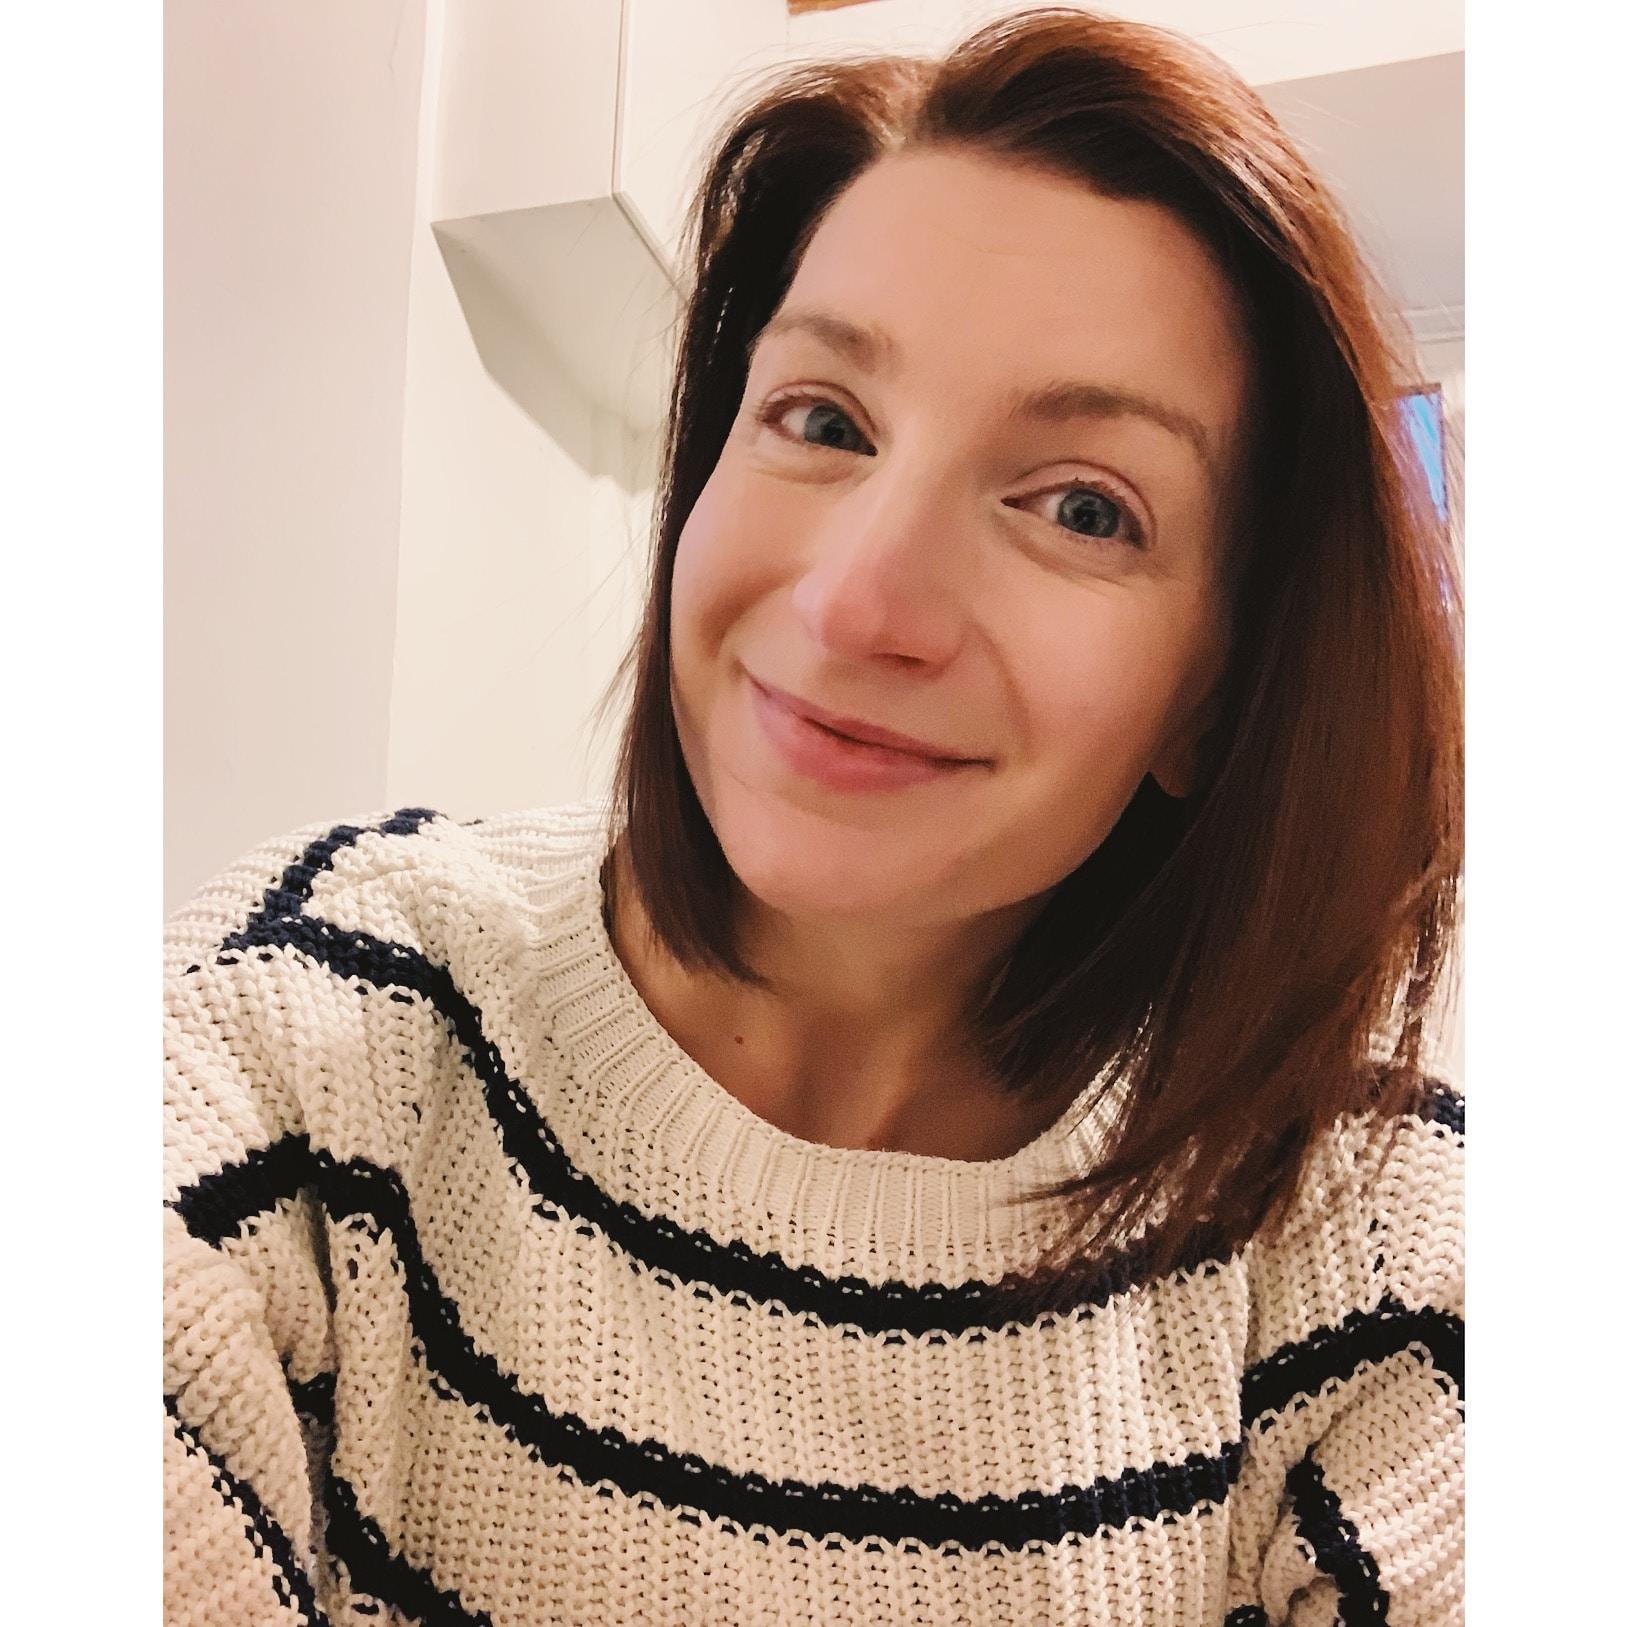 Go to Chloe Skinner's profile